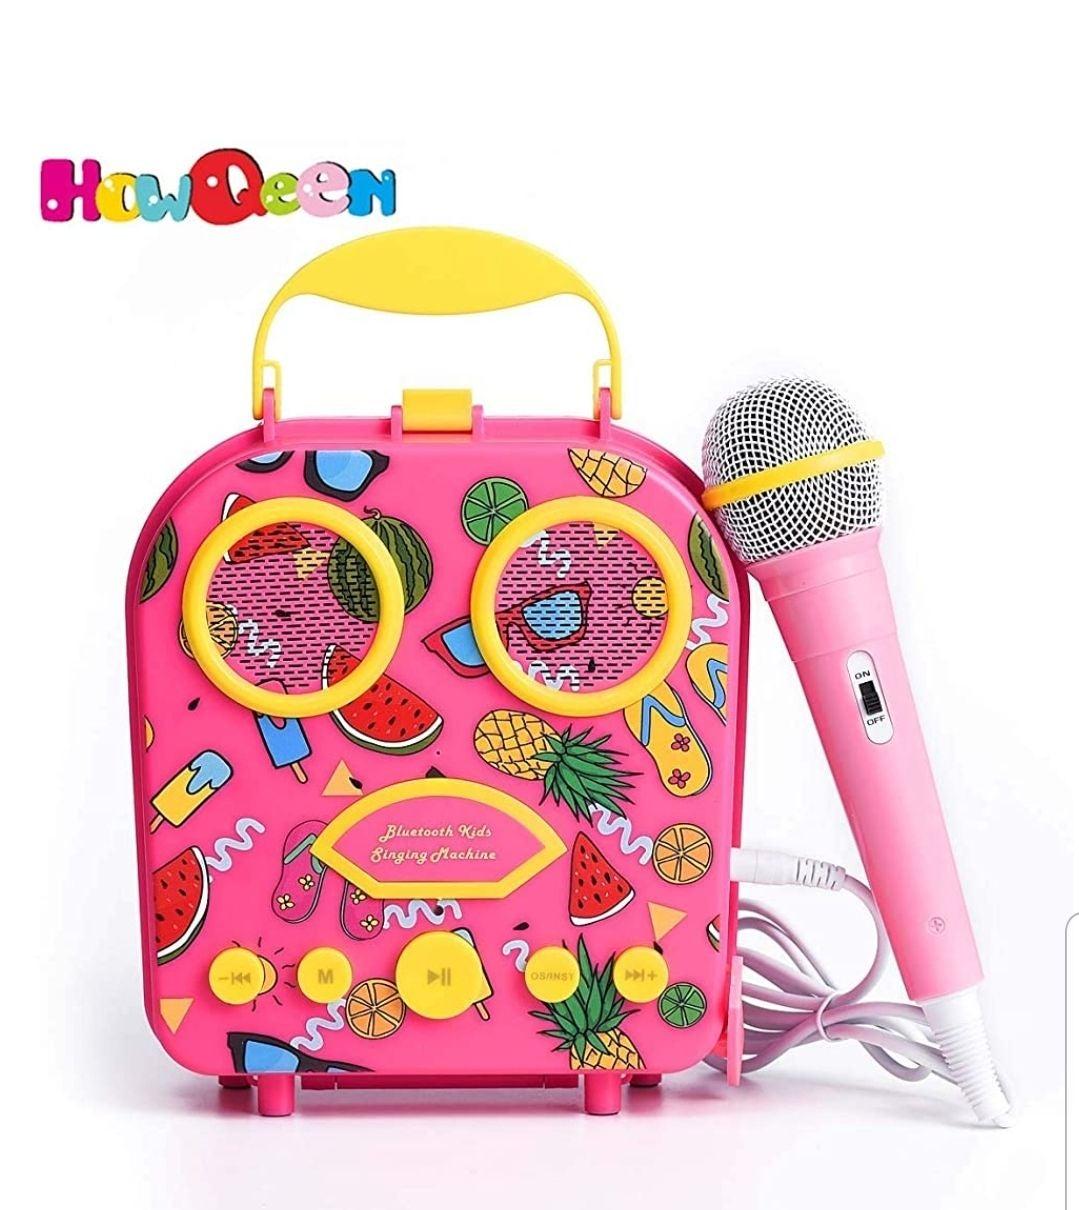 Bluetooth Speaker Children's Karaoke